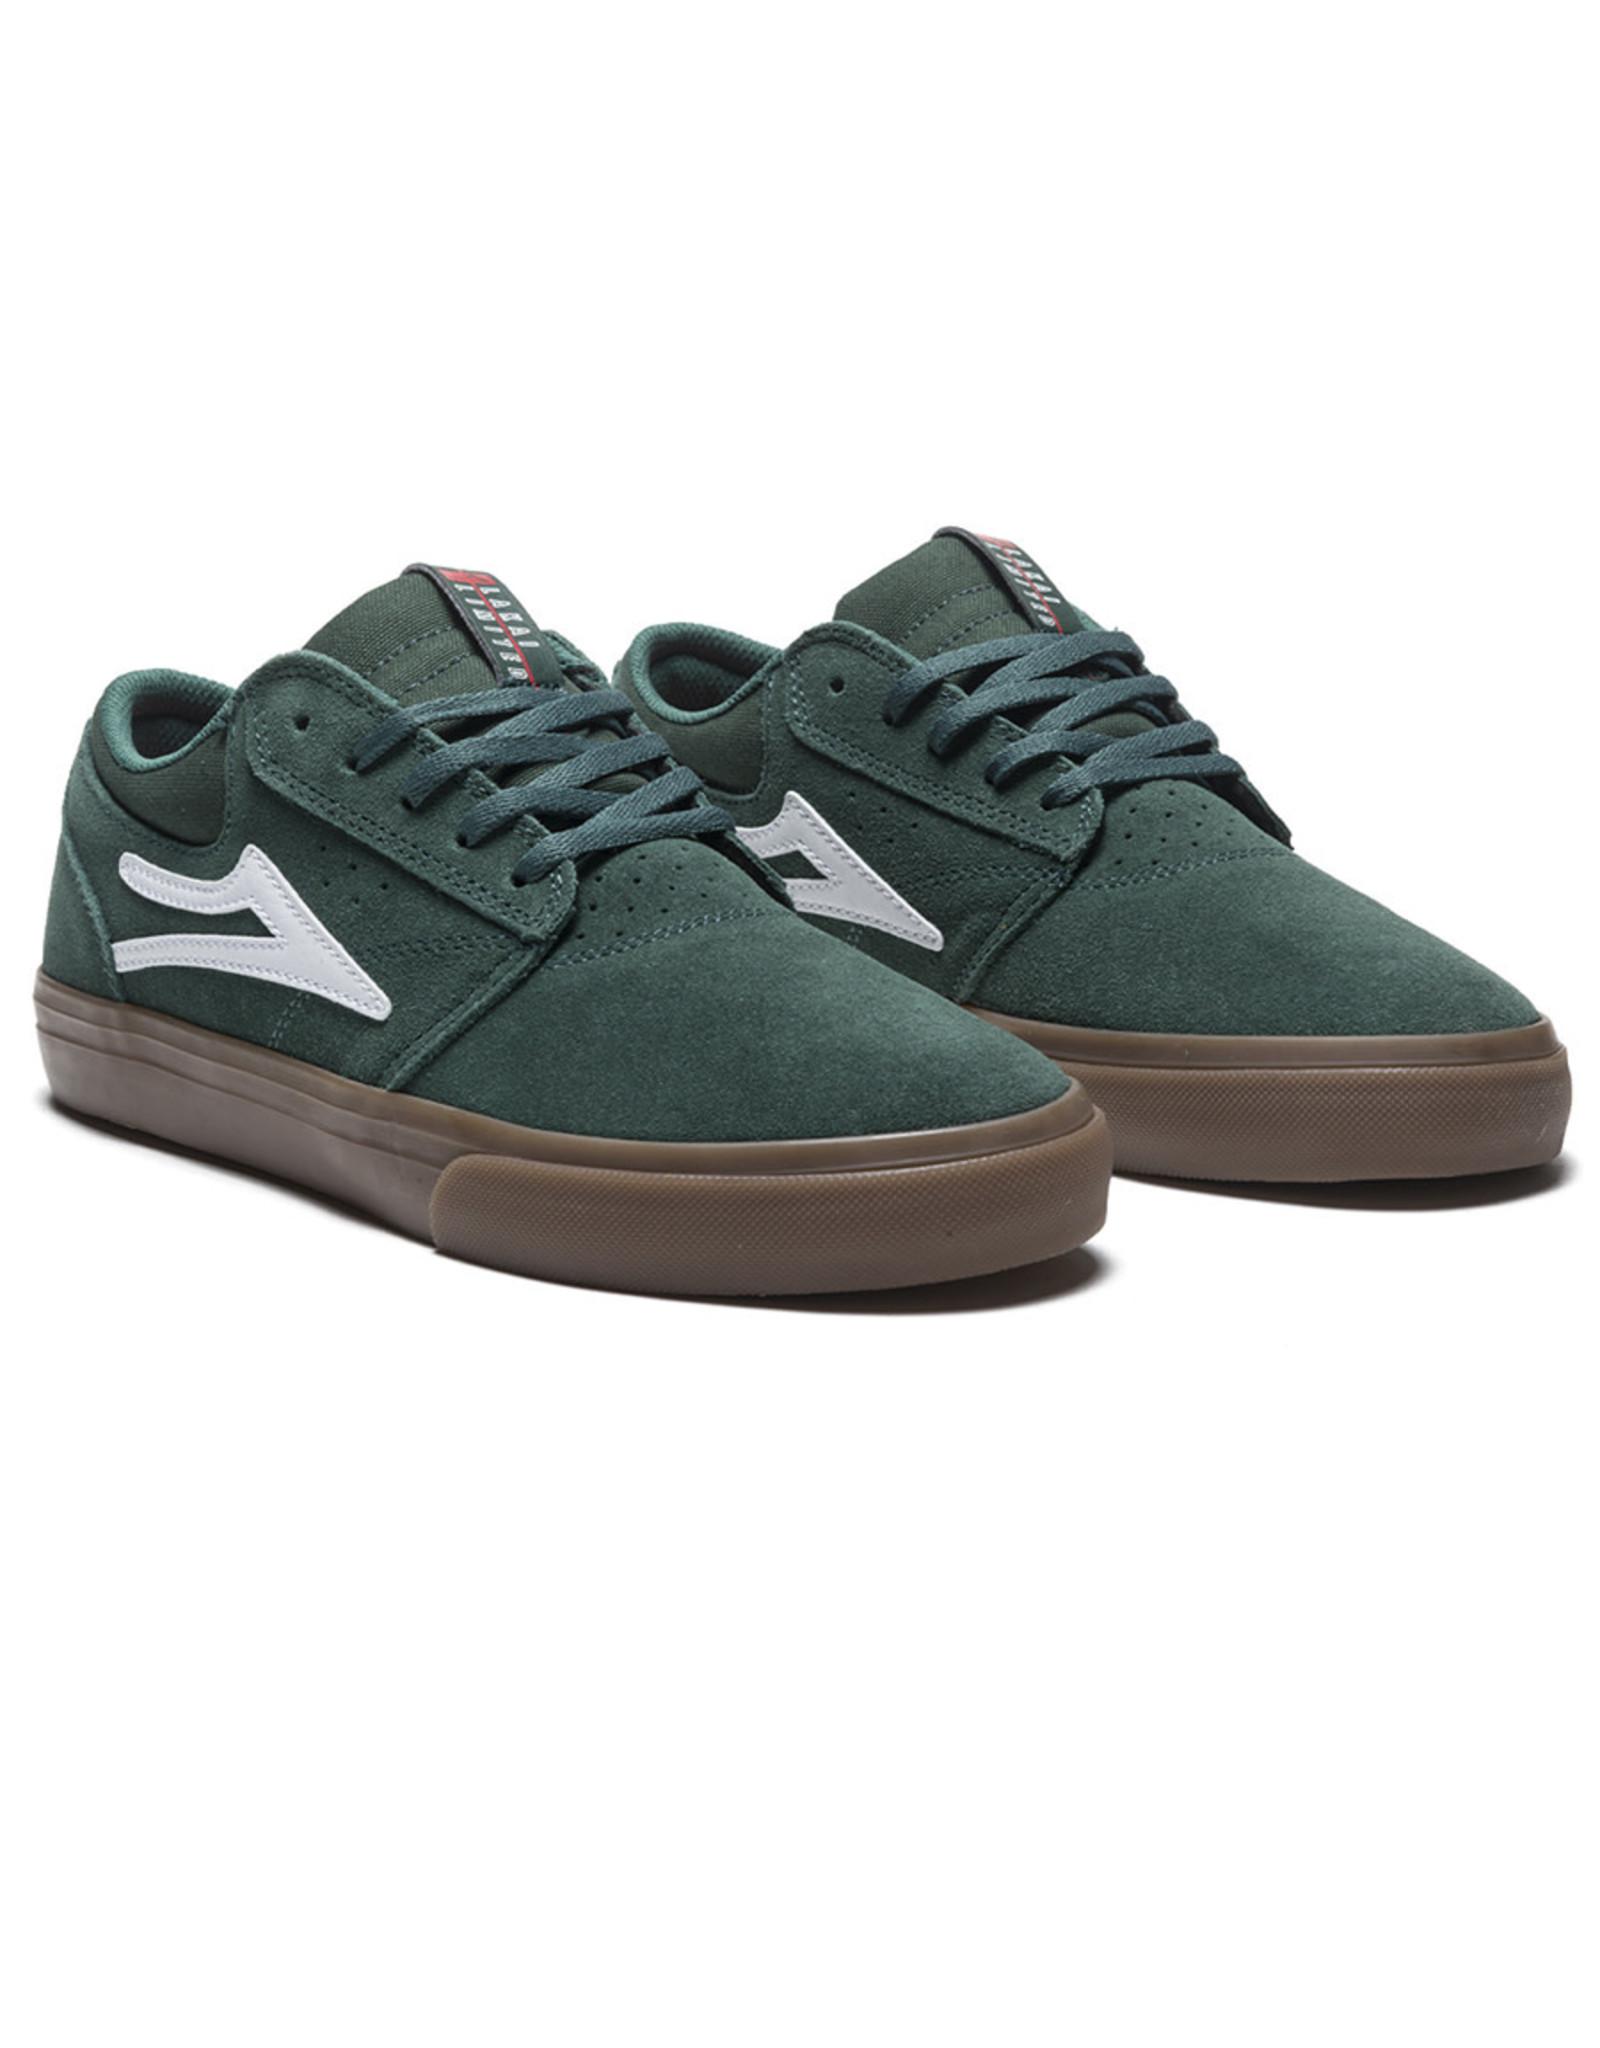 Lakai Shoes Lakai Shoe Griffin (Pine/Gum Suede)